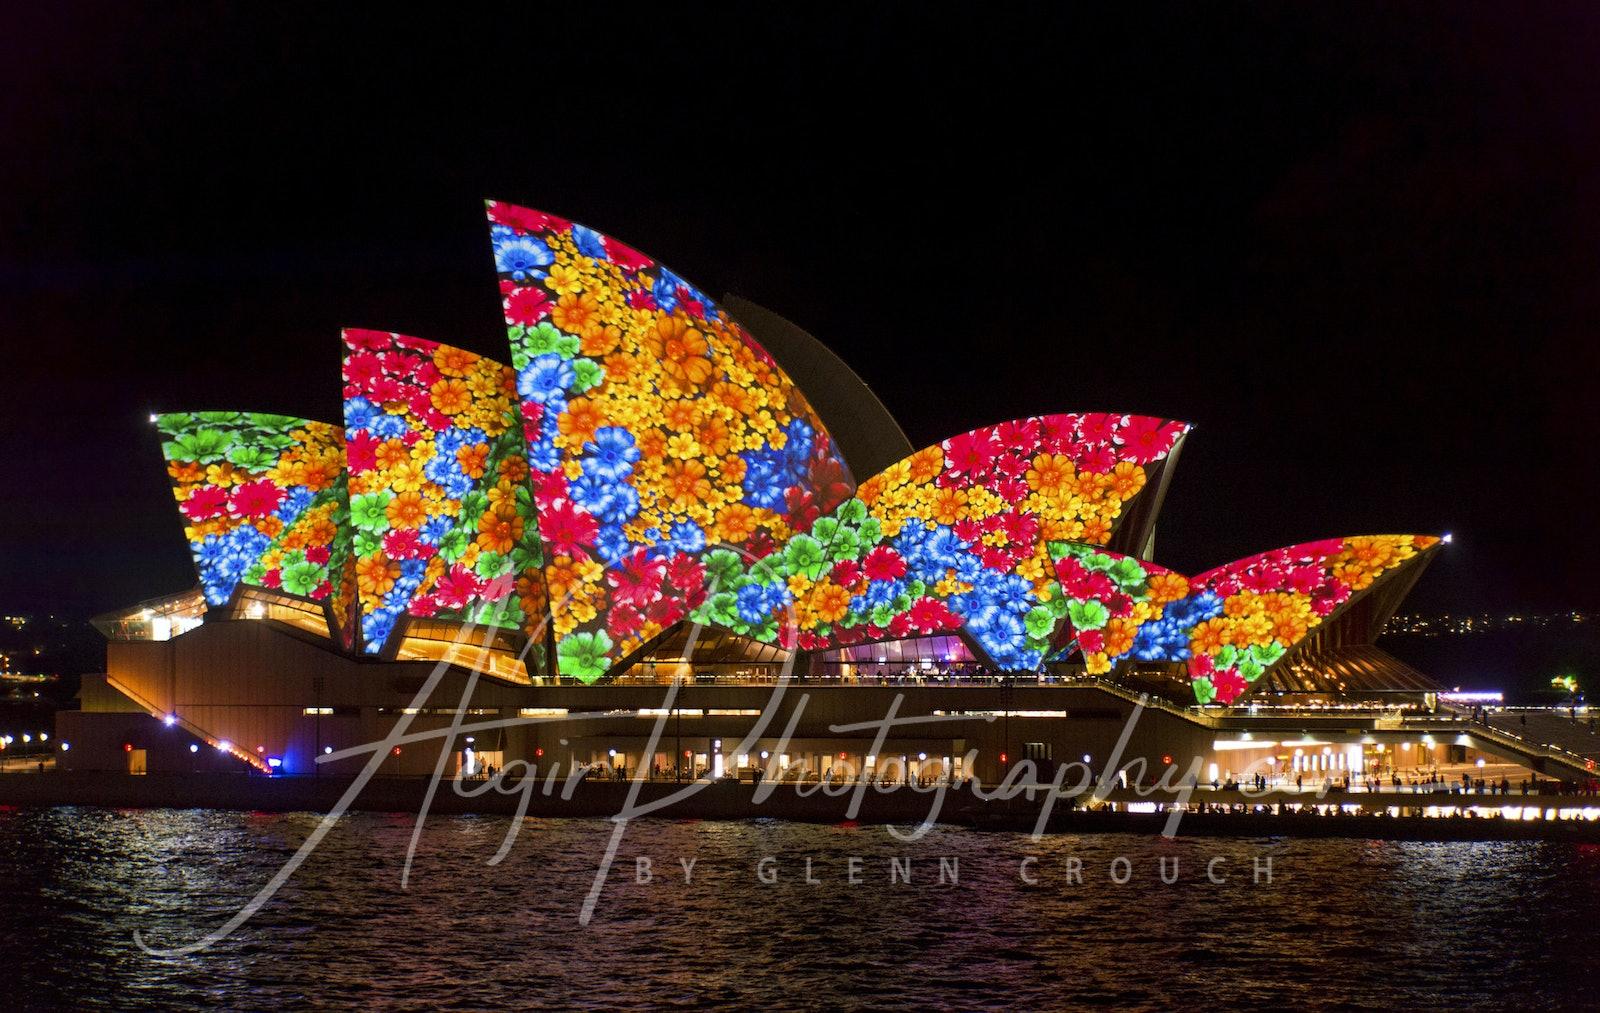 VIVID 2016 - Opera House - Lighting the Sails display during VIVID 2016, Sydney